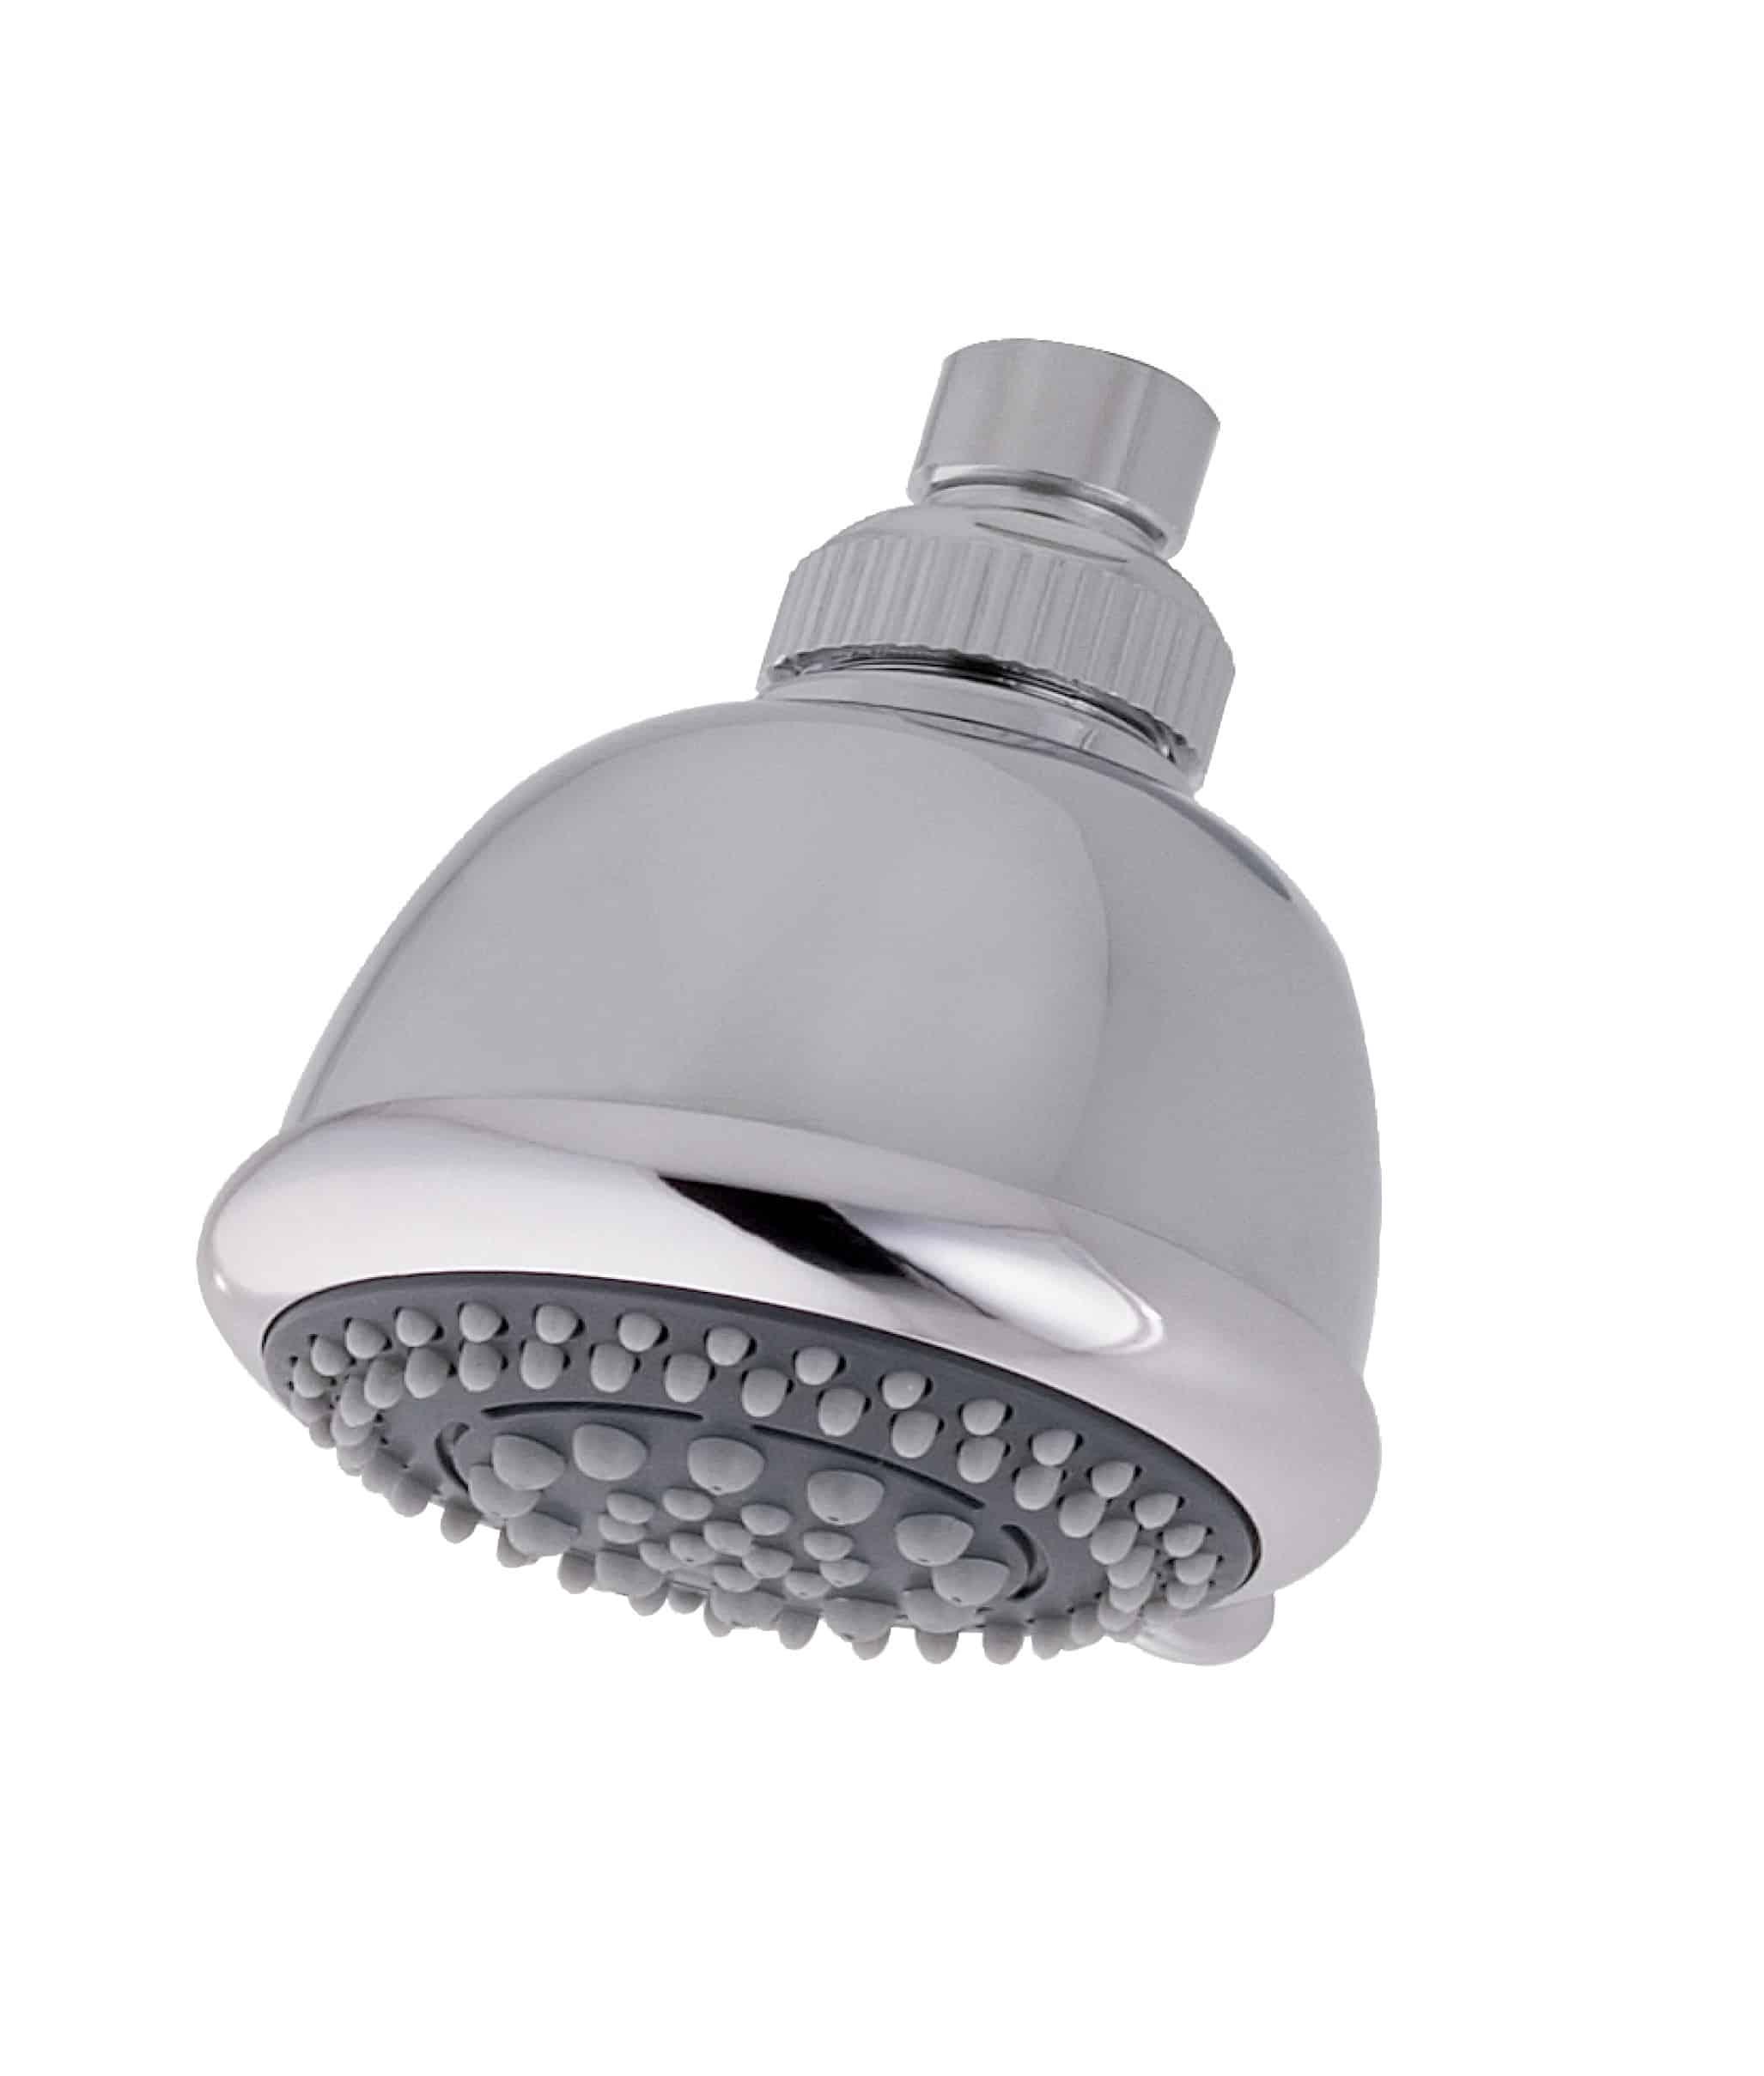 MX Energy 6 Mode Fixed Shower Head Chrome   Niko Bathrooms